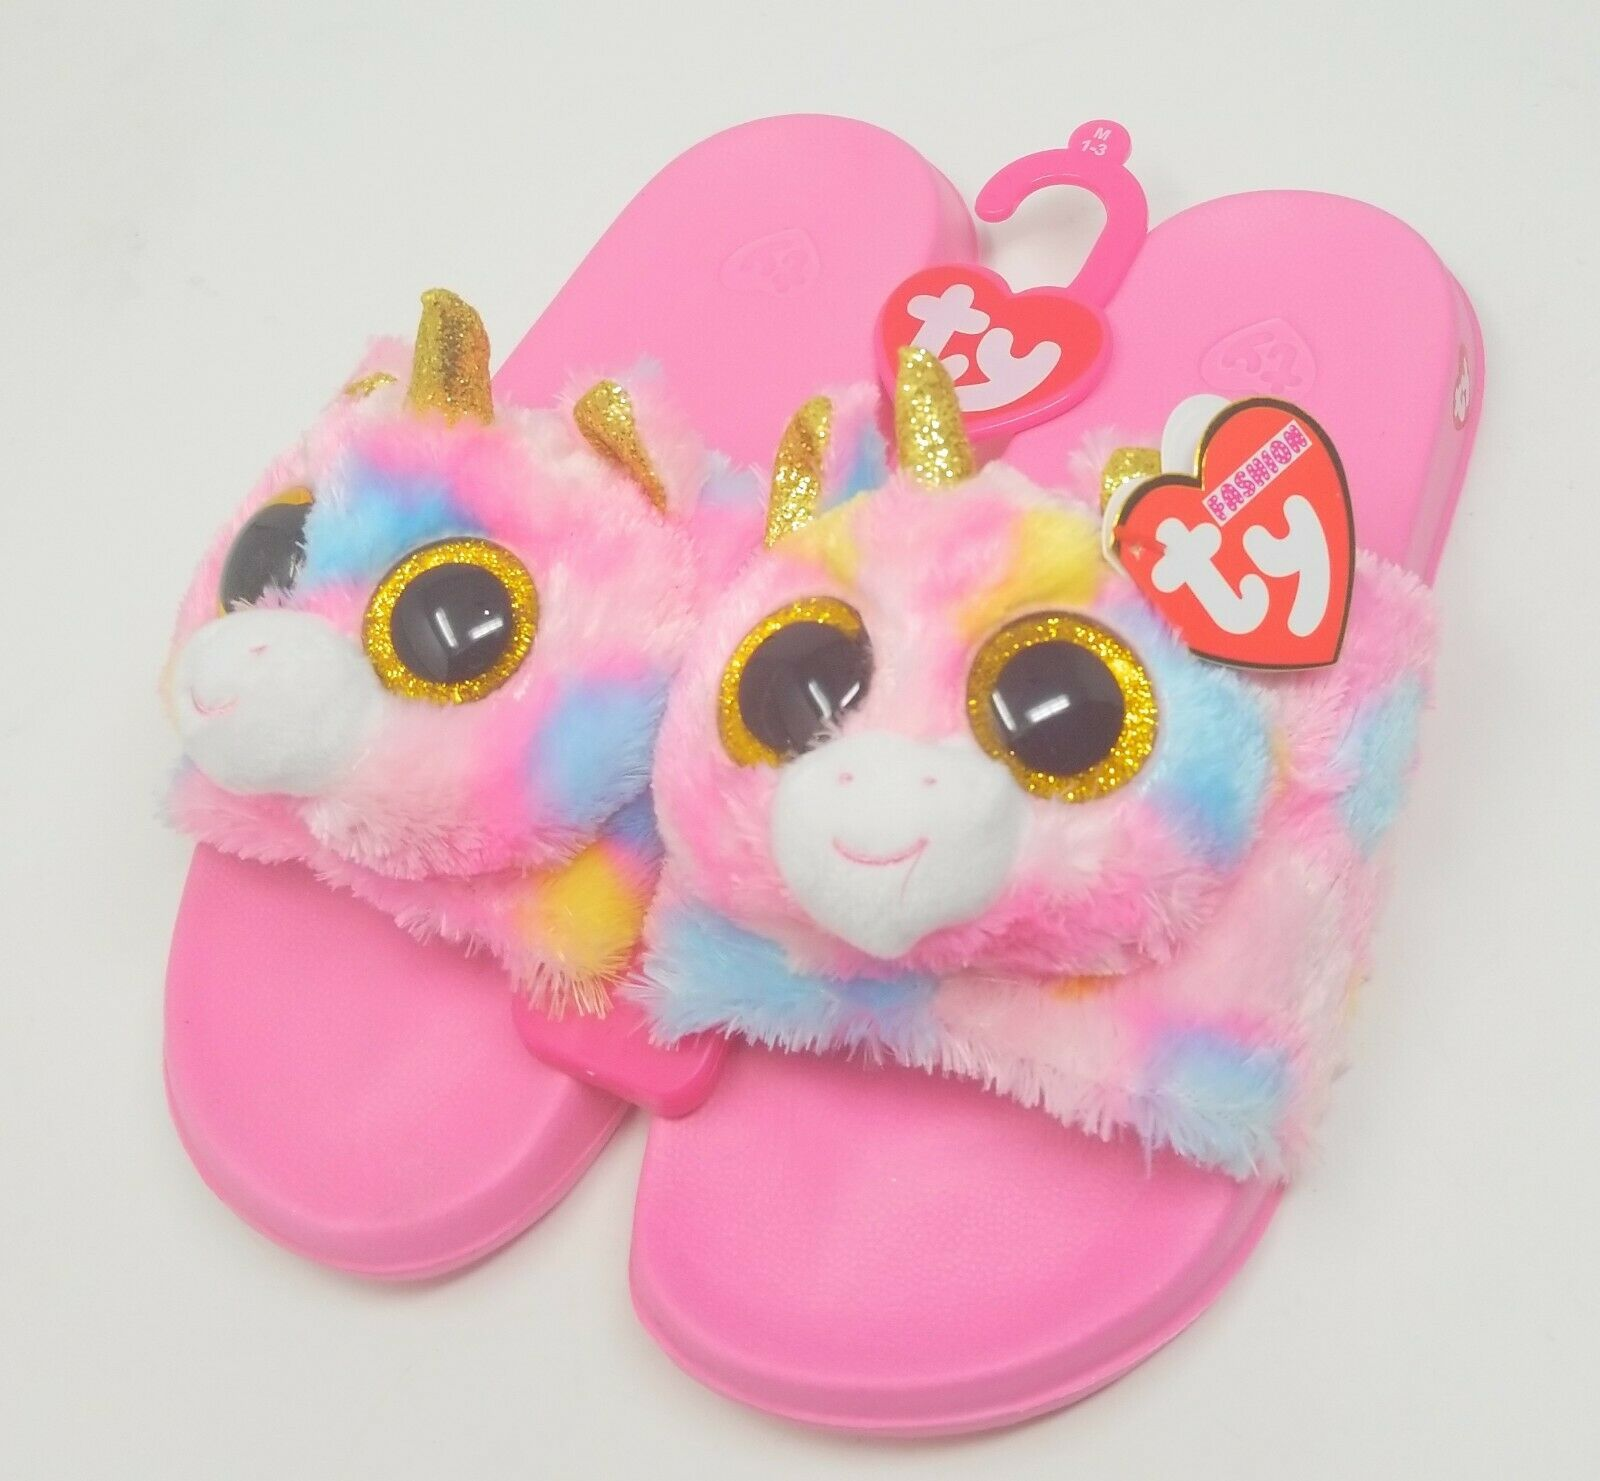 Girls Unicorn Slippers Ty Beanie Babies Shoes Fantasia Plush Slides Pink M 1-3